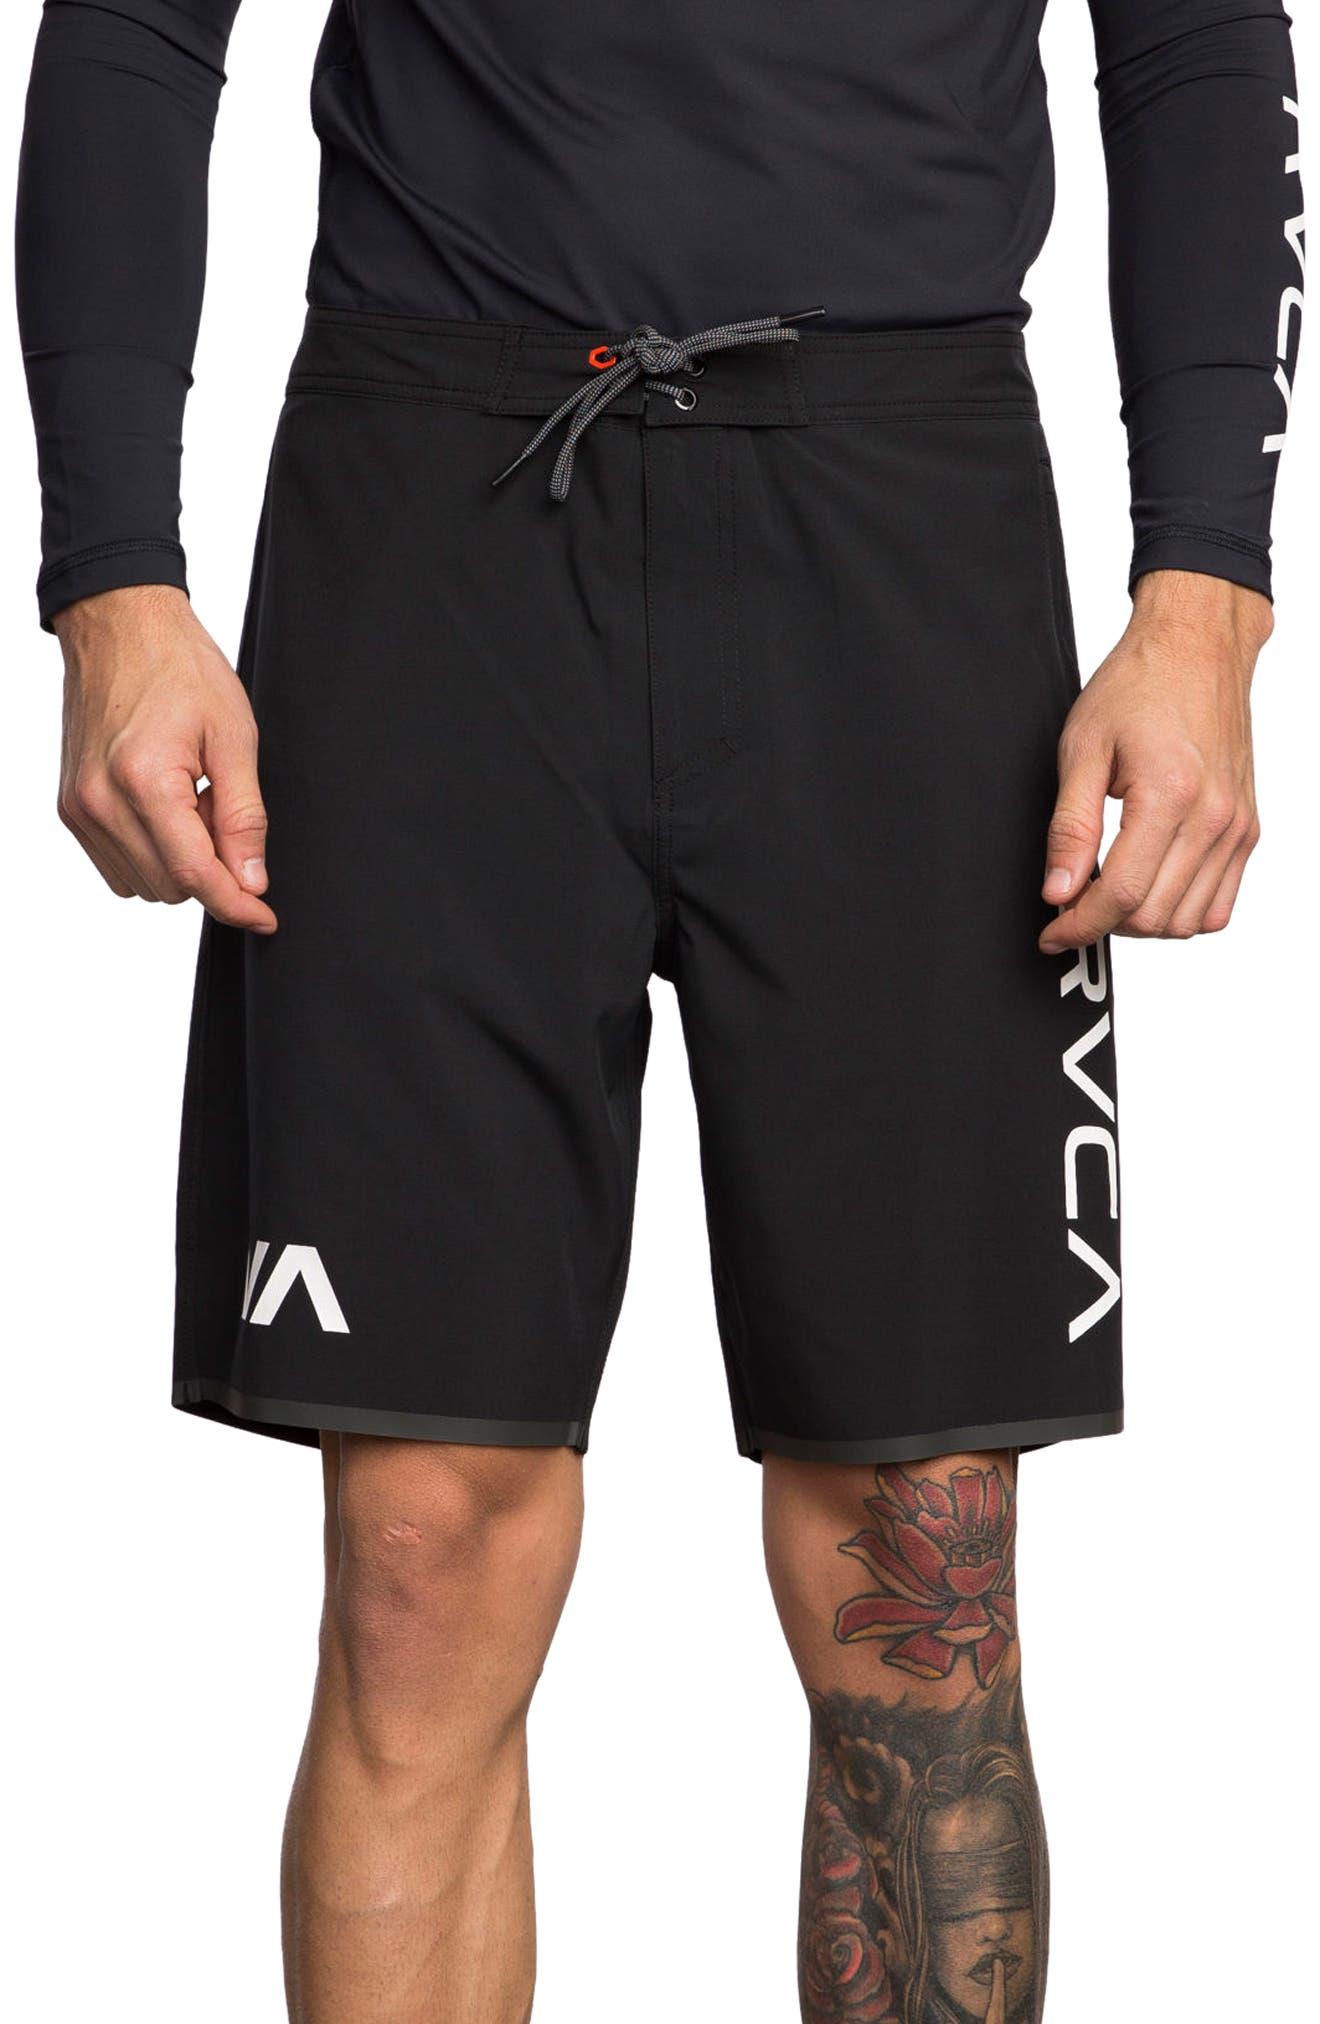 Staff III Dual Layer Performance Shorts,                         Main,                         color, Black